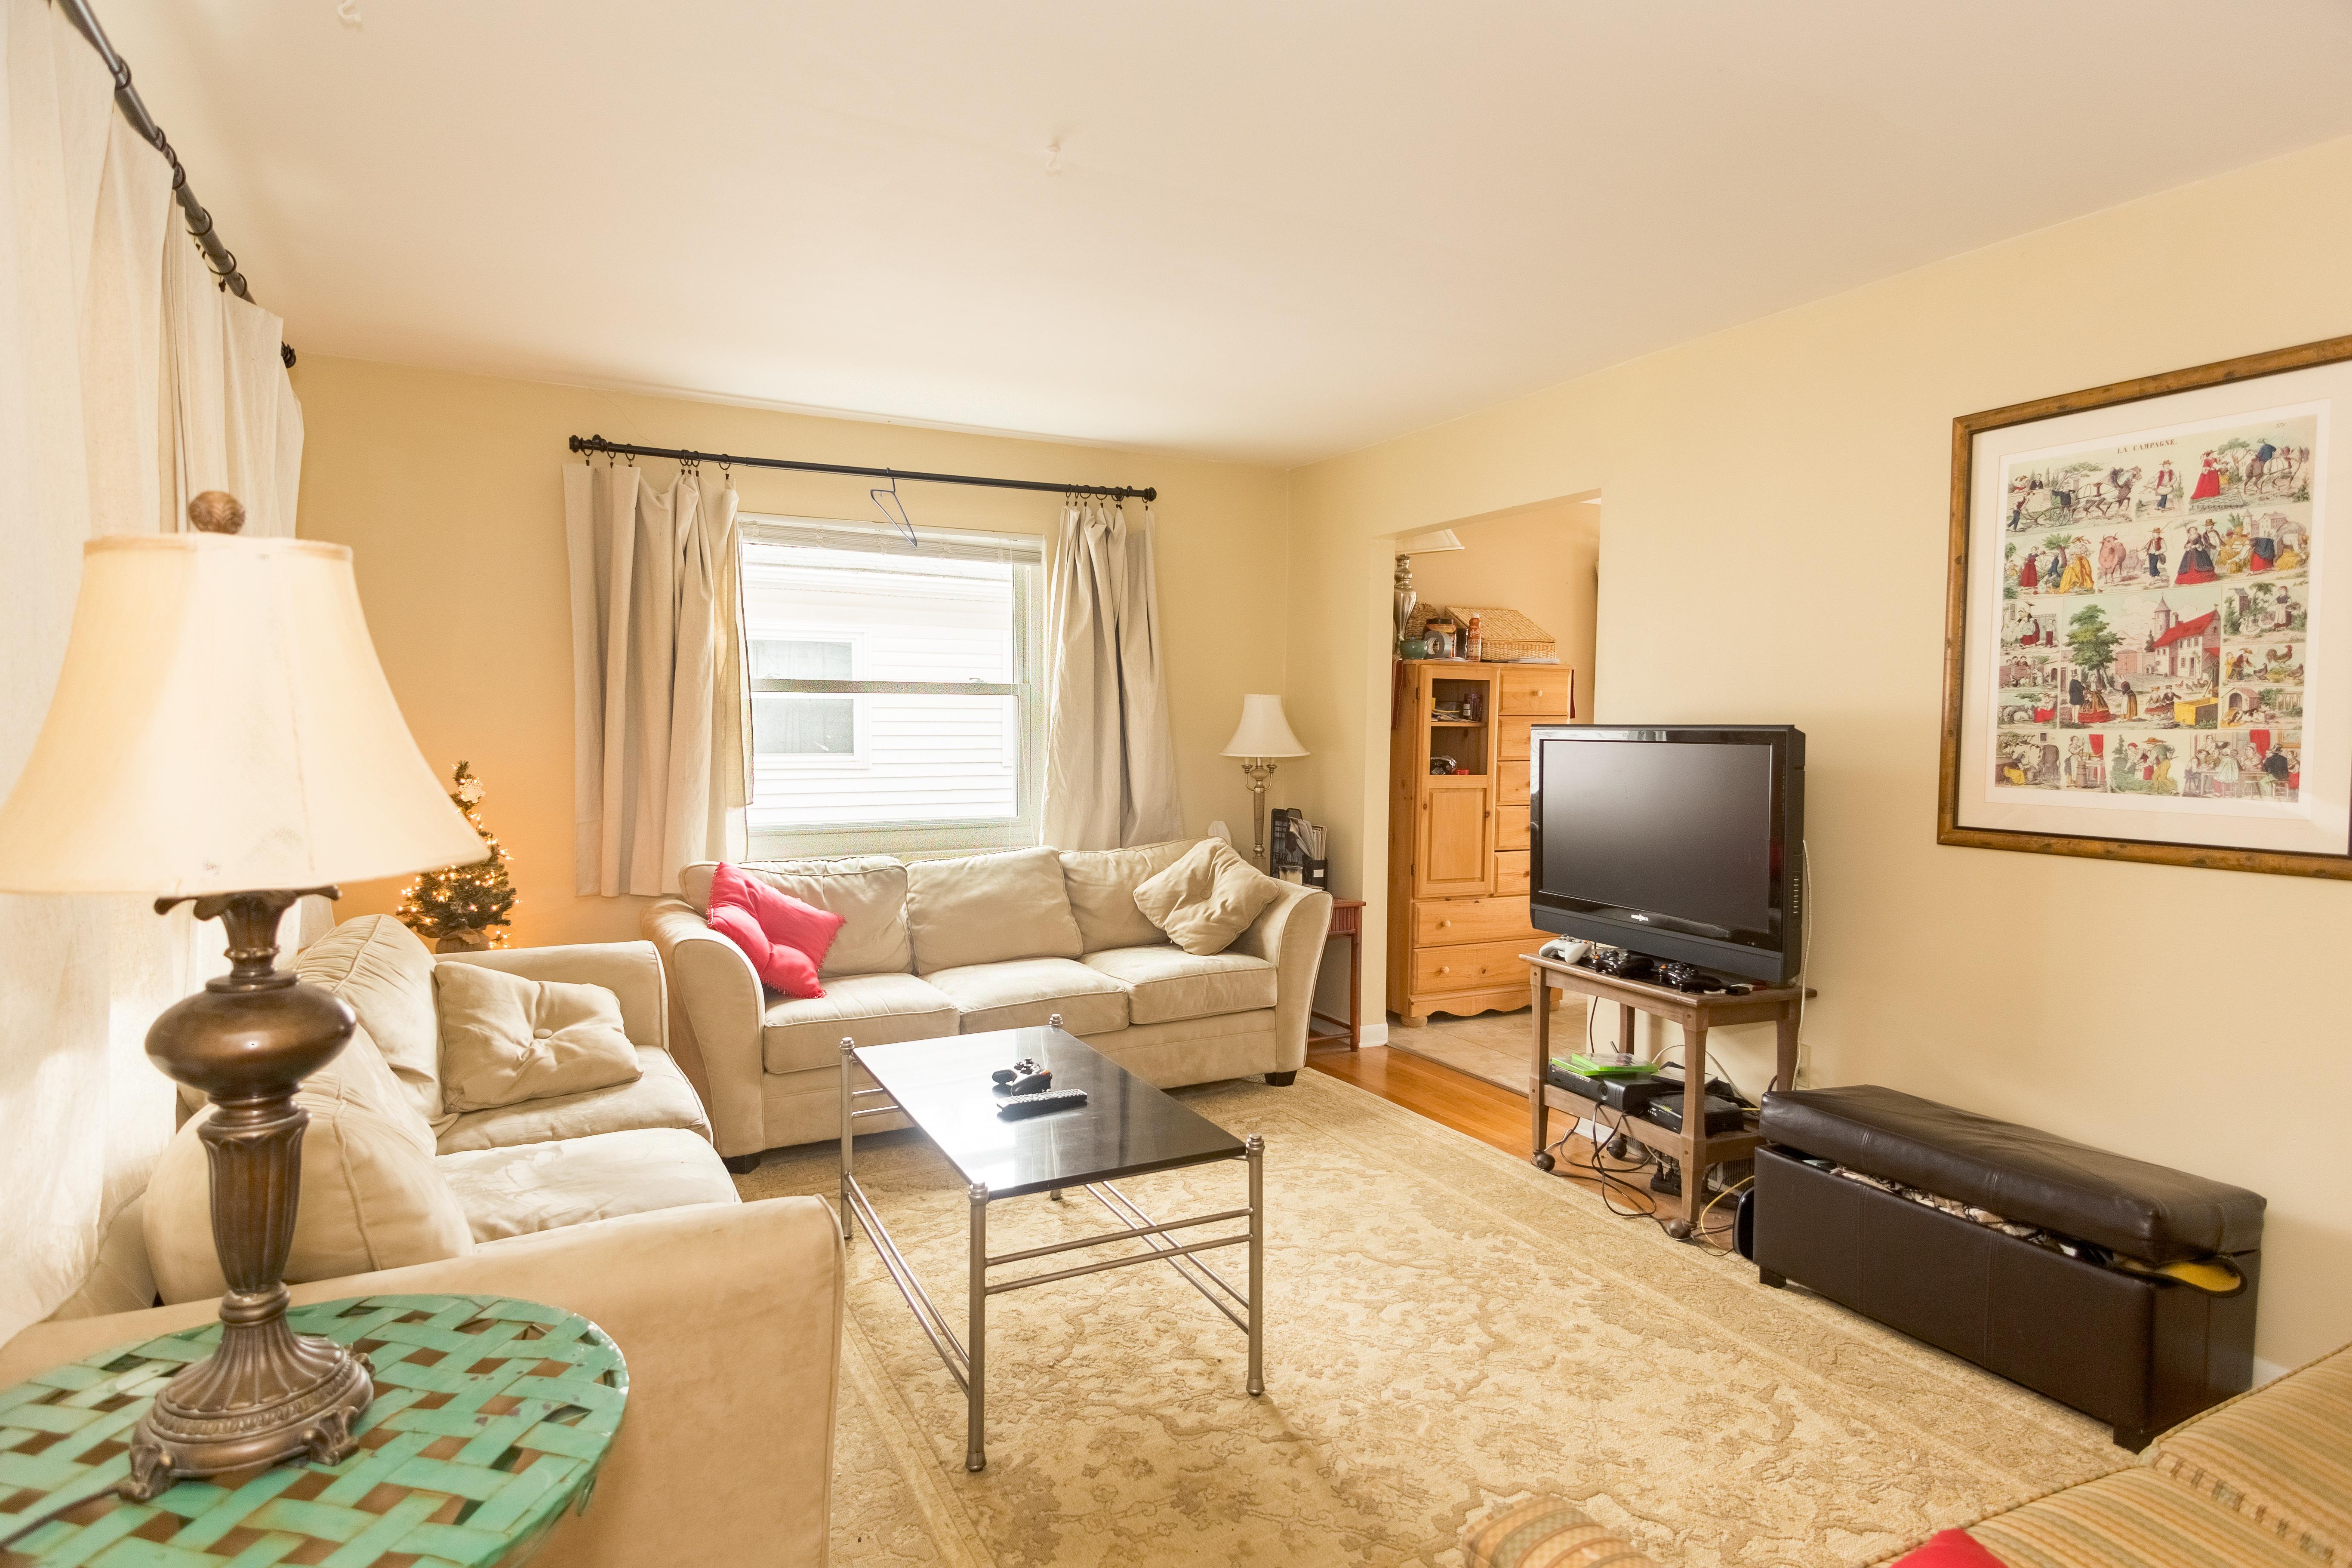 Villa House Floor Home Cottage Property Living Room Room Bedroom Apartment  Interior Design Hardwood Estate Suite